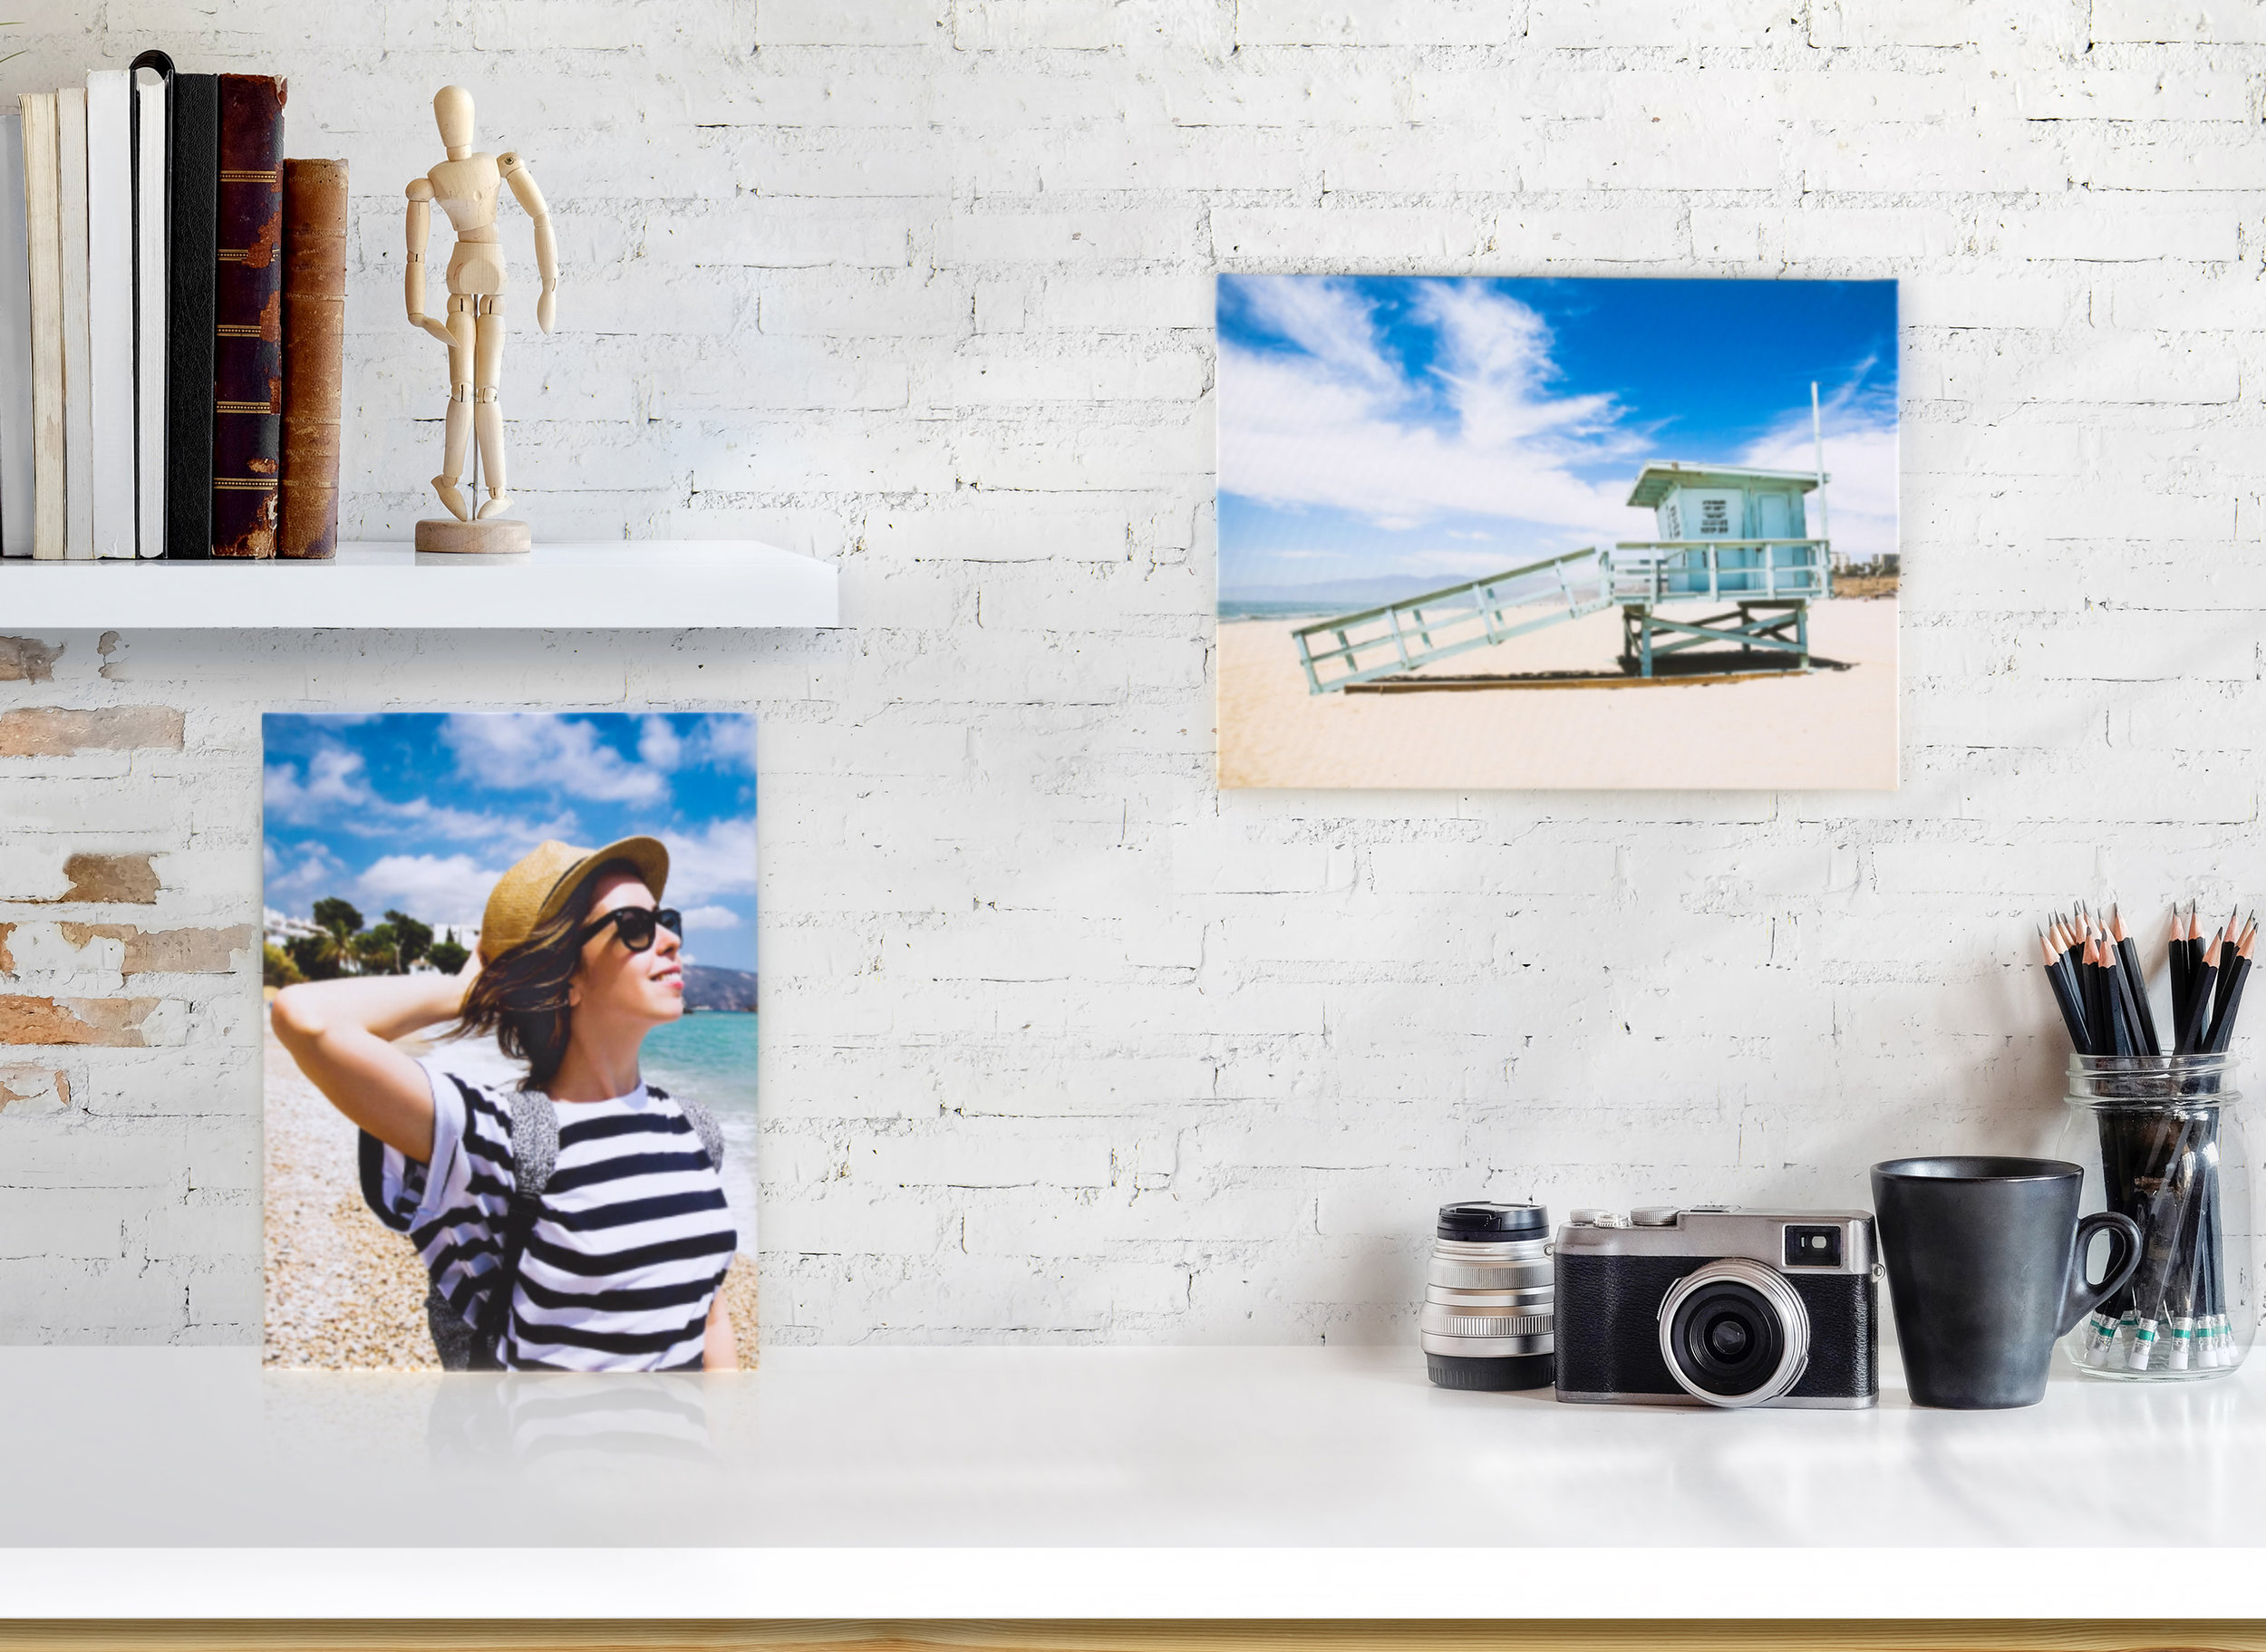 Canvas-Home-decor-4.jpg